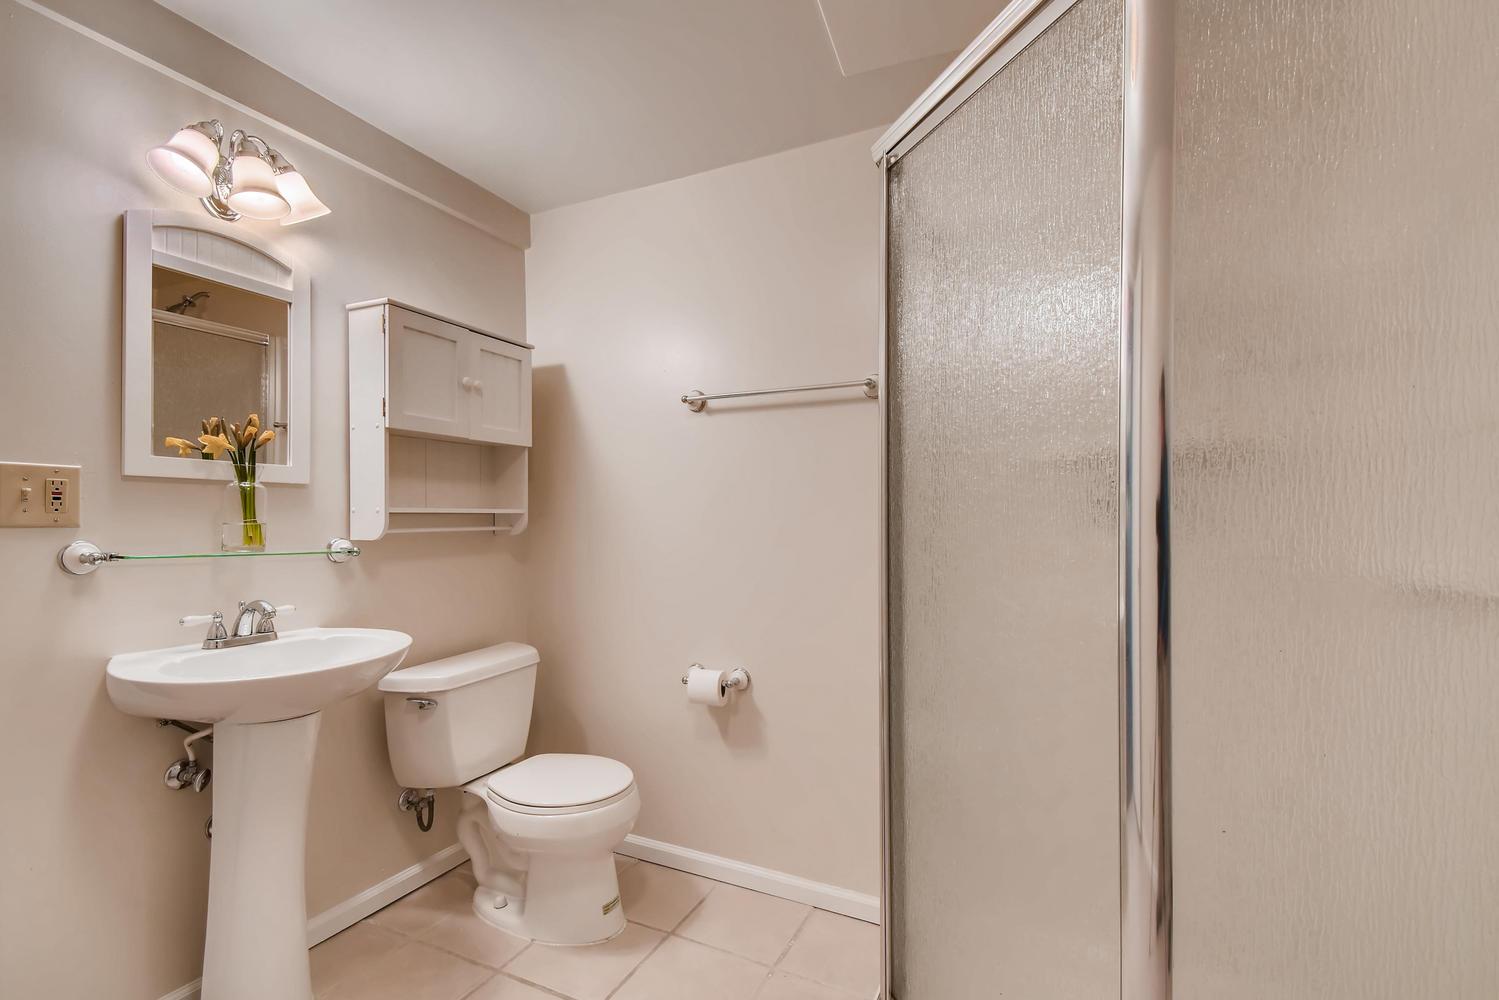 472 Owl Dr Louisville CO 80027-large-022-24-Lower Level Bathroom-1499x1000-72dpi.jpg